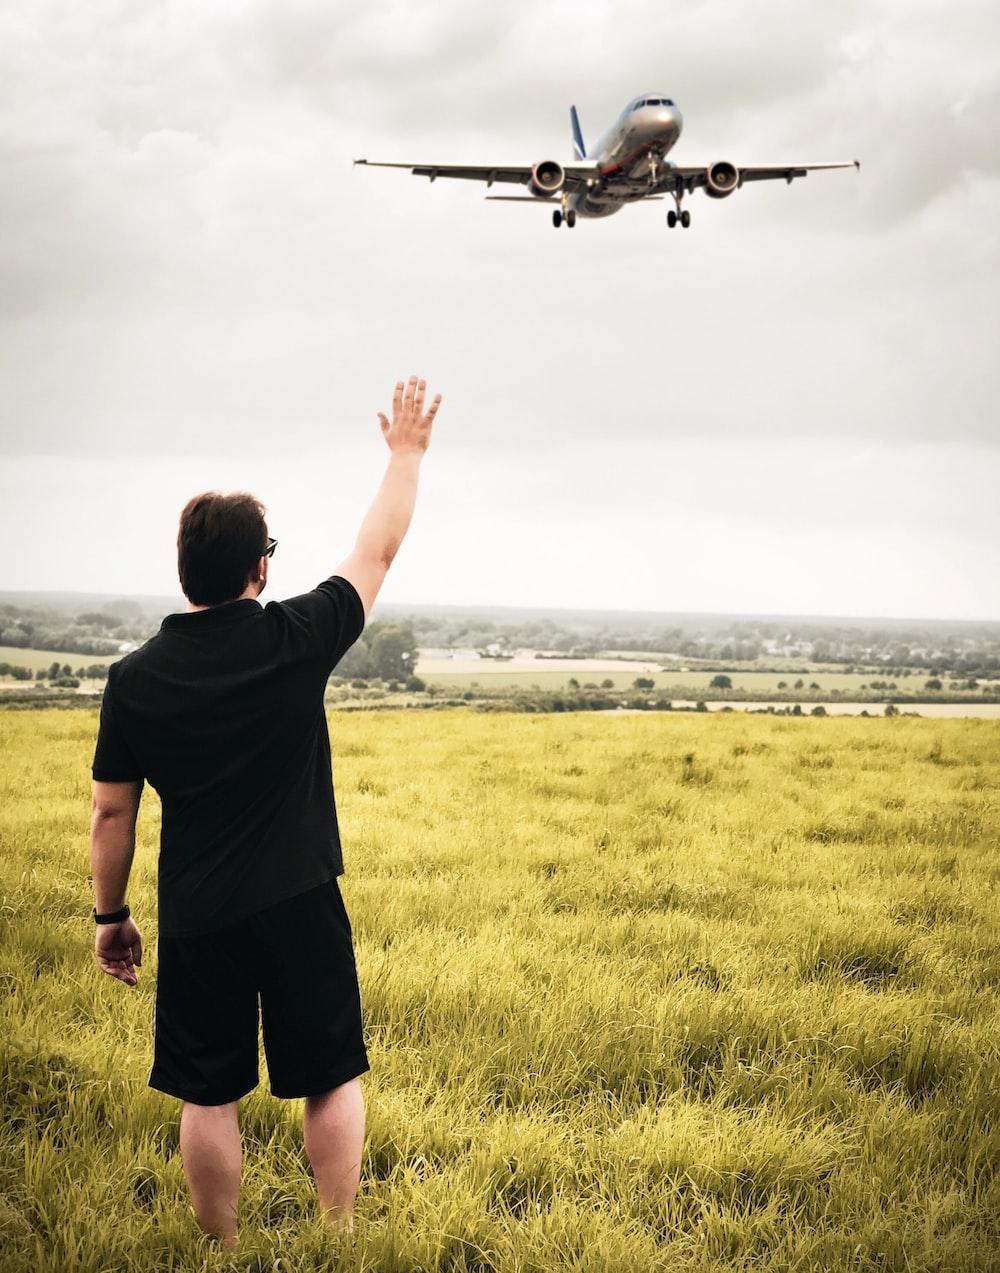 man raising his right hand looking at plane